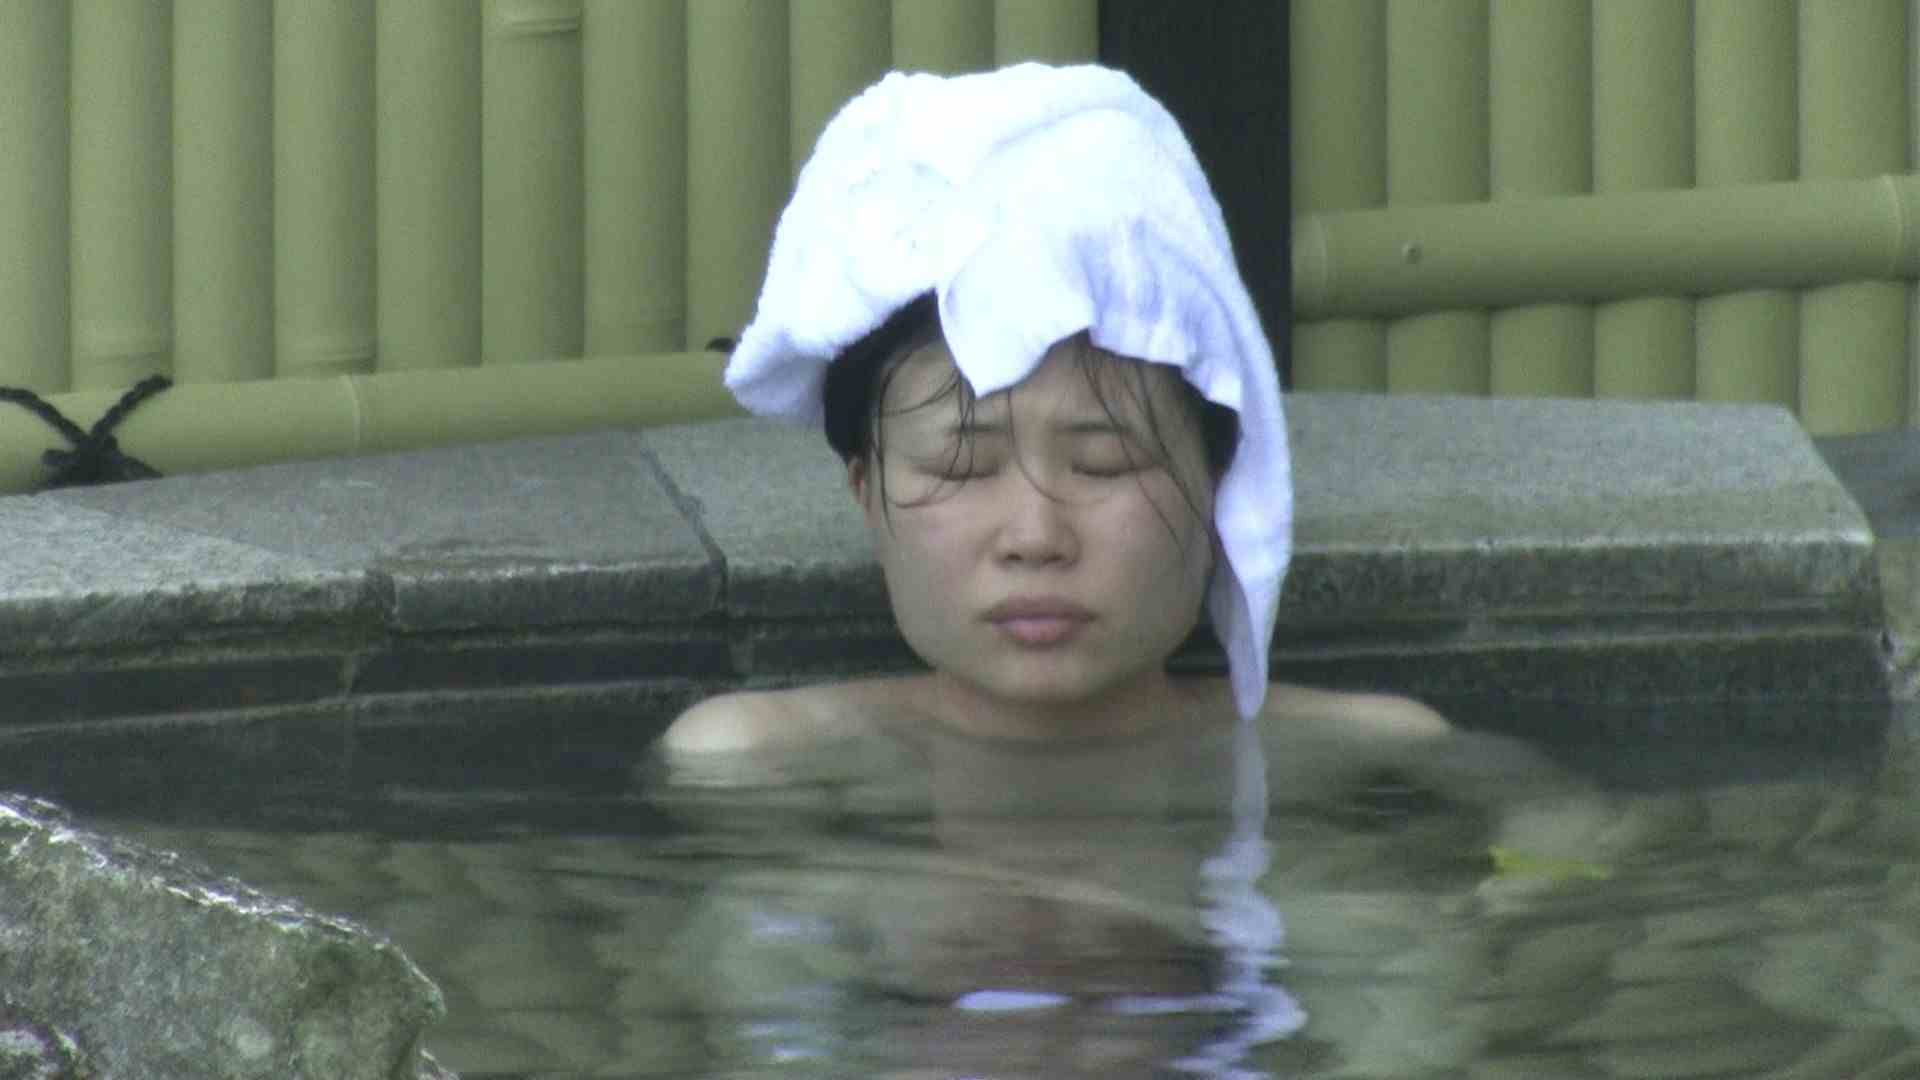 Aquaな露天風呂Vol.183 盗撮 | OLセックス  69画像 52